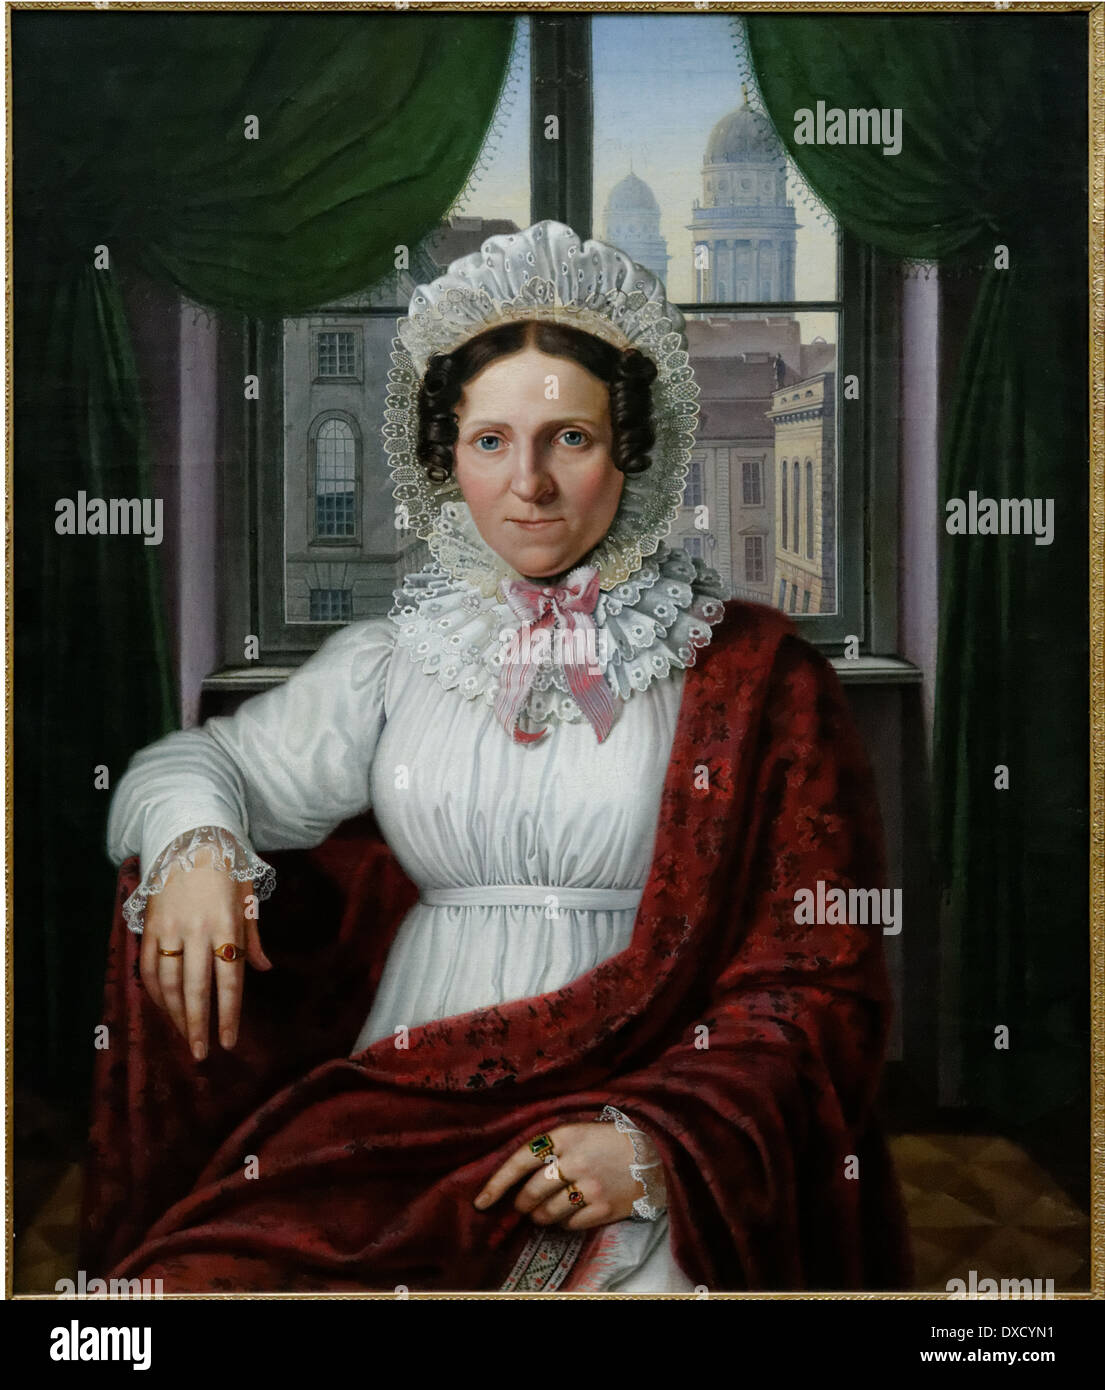 Joham Erdmann Hummel - Frau Luise Mila - XIX th century - German school - Alte Nationalgalerie - Berlin - Stock Image